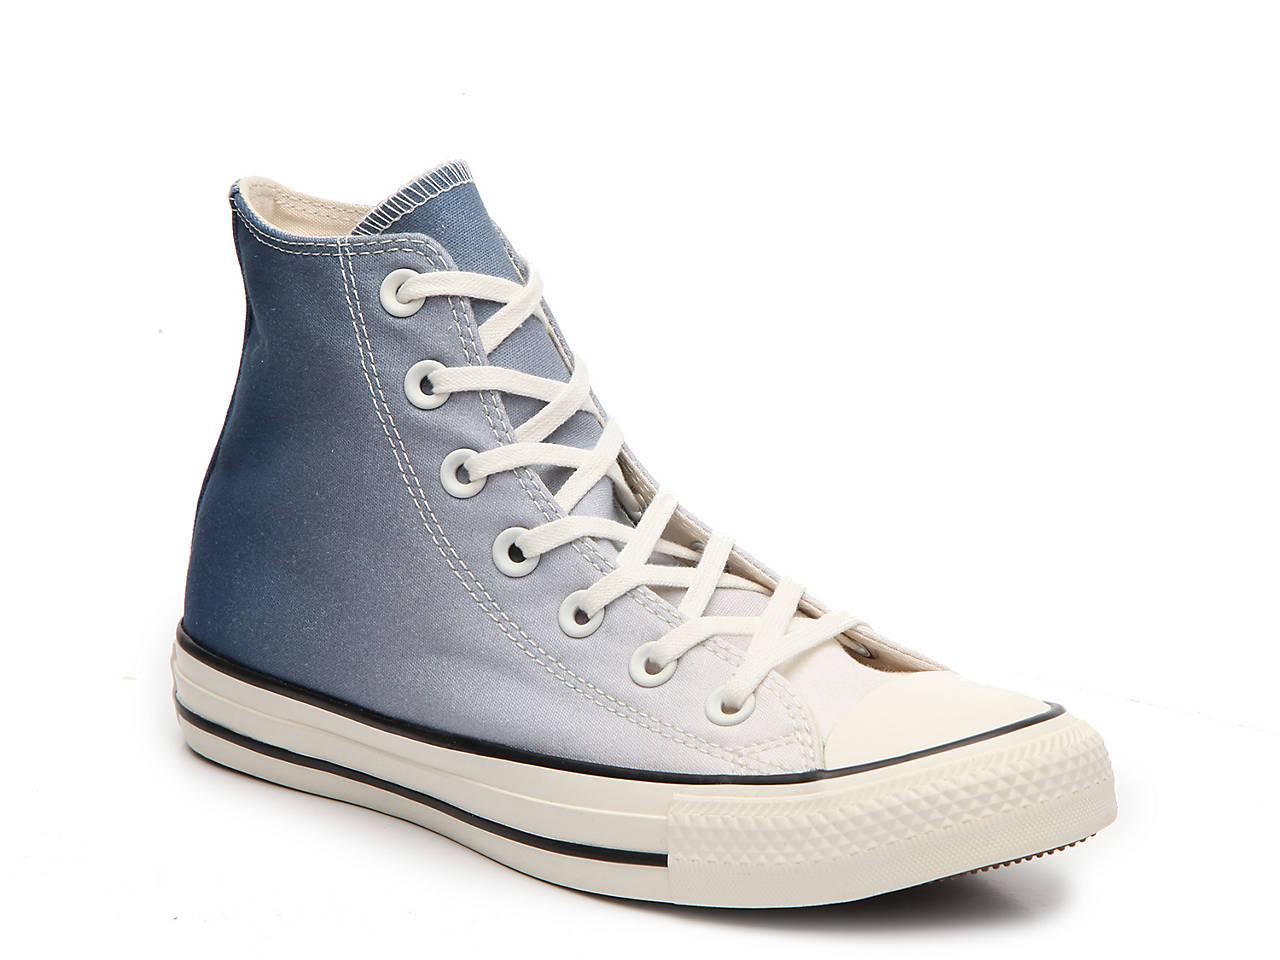 6c73182f2abf Converse Chuck Taylor All Star Storm High-Top Sneaker - Women s ...